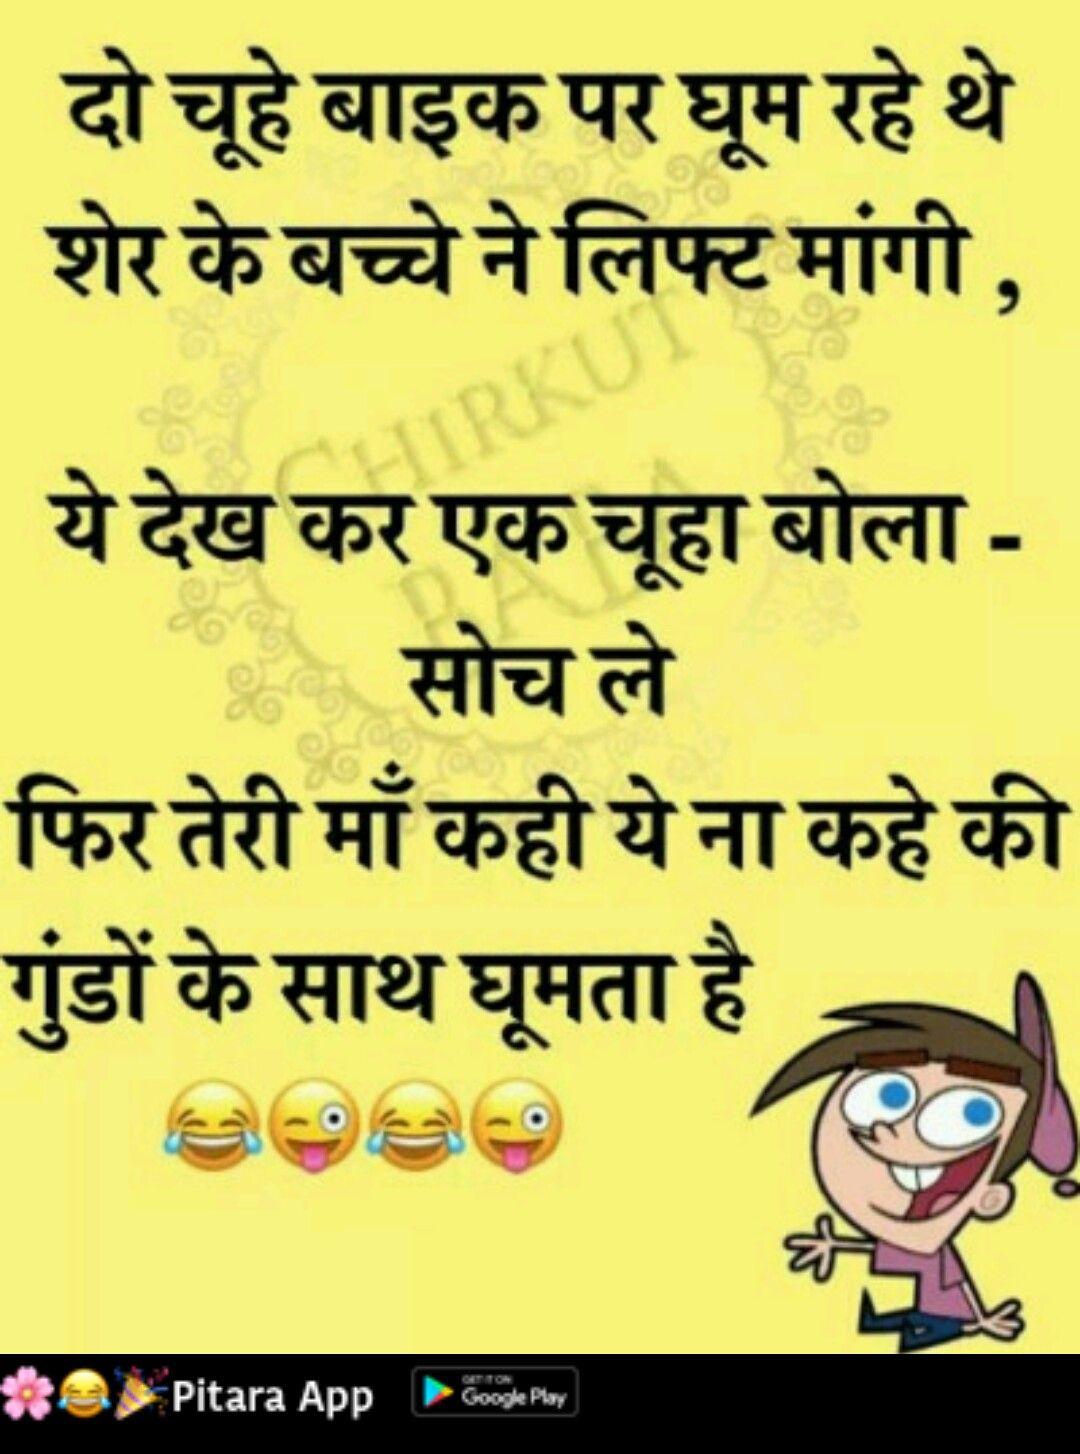 Funny Jokes Quotes Pinnarendra Pal Singh On Jokes  Pinterest  Hindi Jokes And